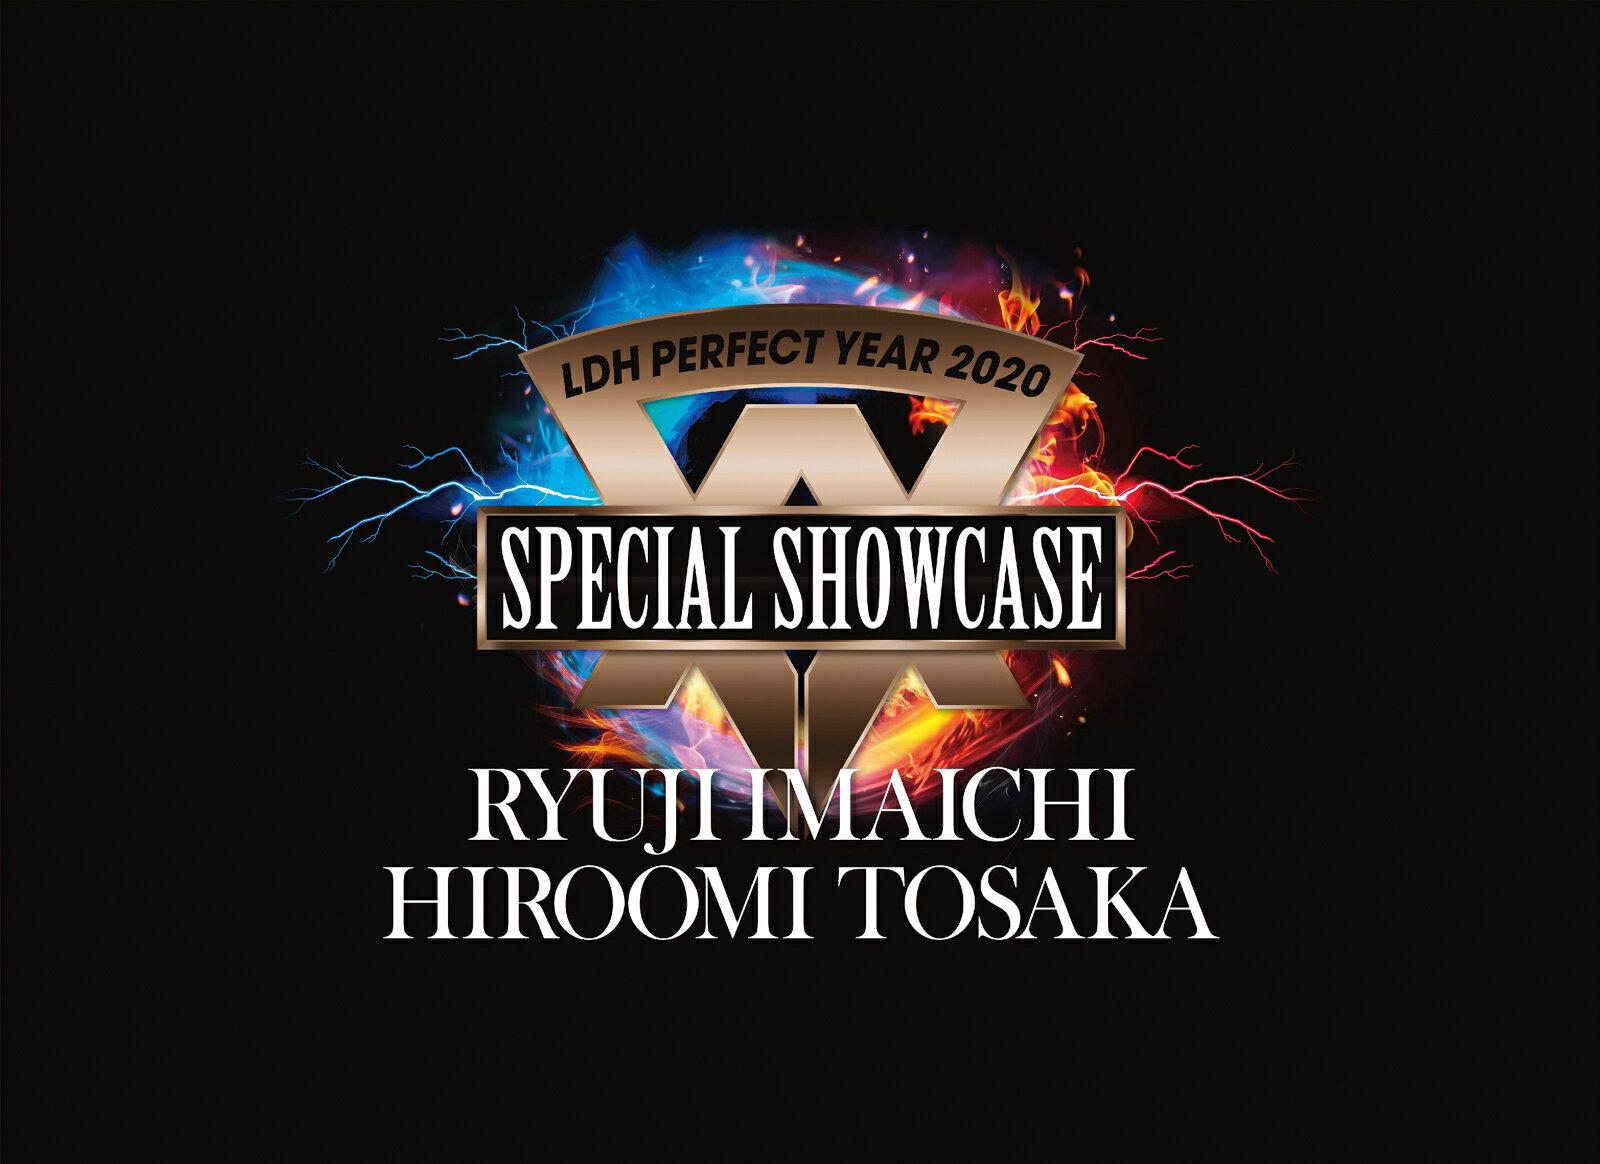 LDH PERFECT YEAR 2020 SPECIAL SHOWCASE RYUJI IMAICHI / HIROOMI TOSAKA【Blu-ray】